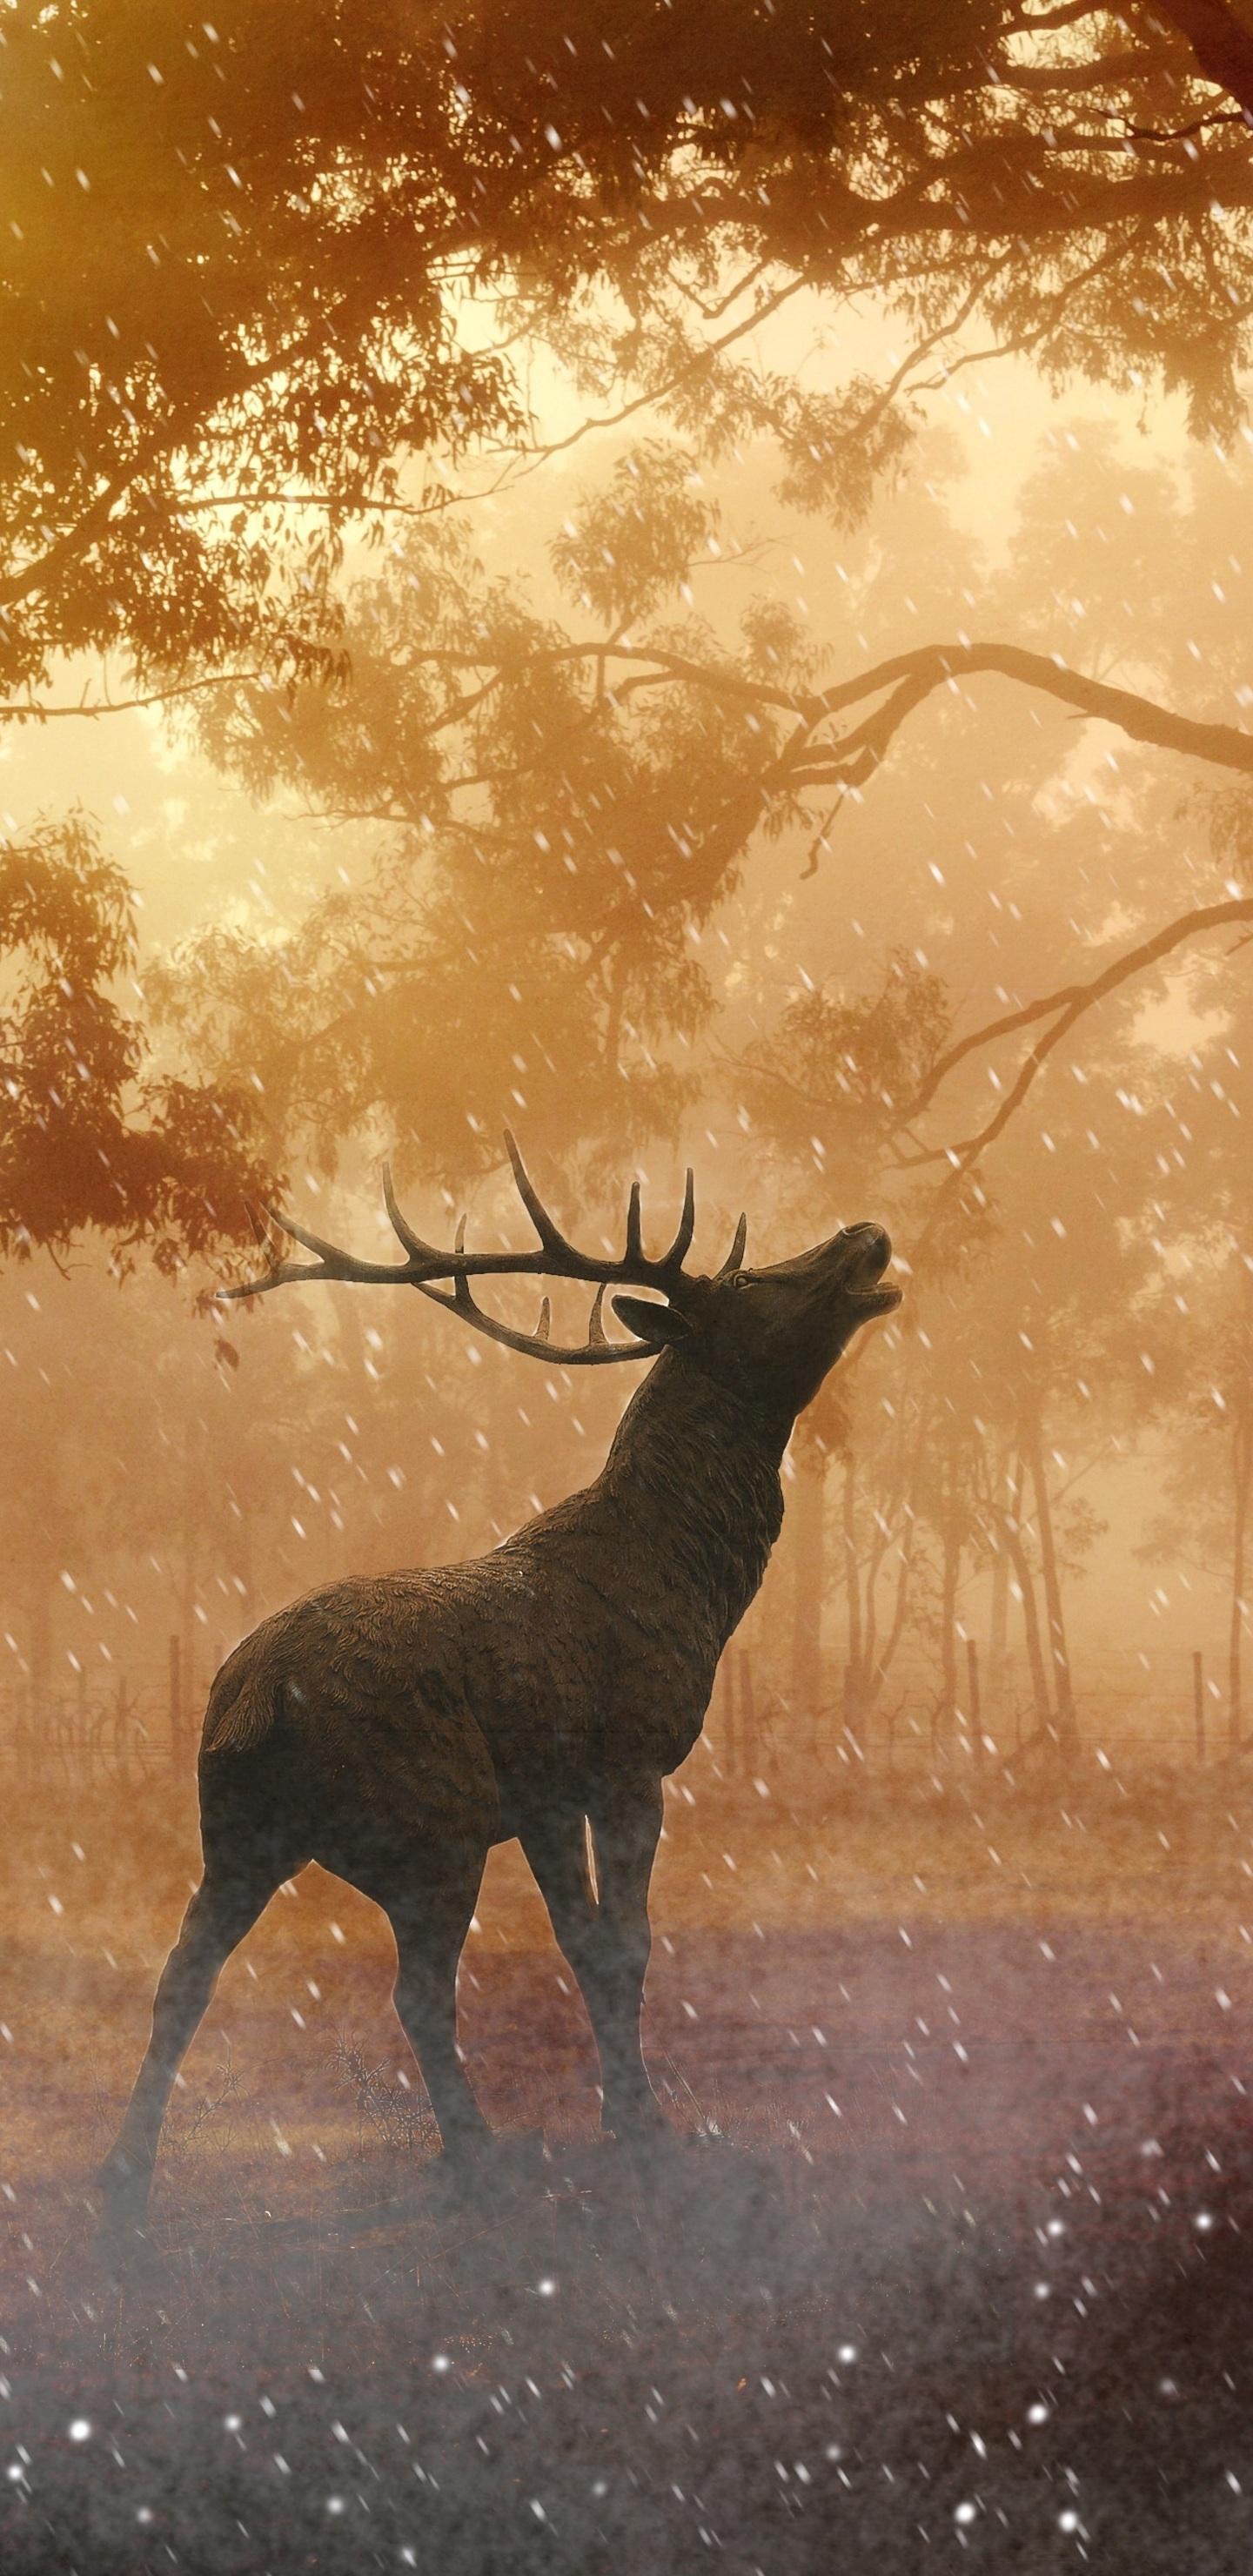 1440x2960 Deer Wild Nature Forest 4k Samsung Galaxy S8,S8+ ,Note 8 ...